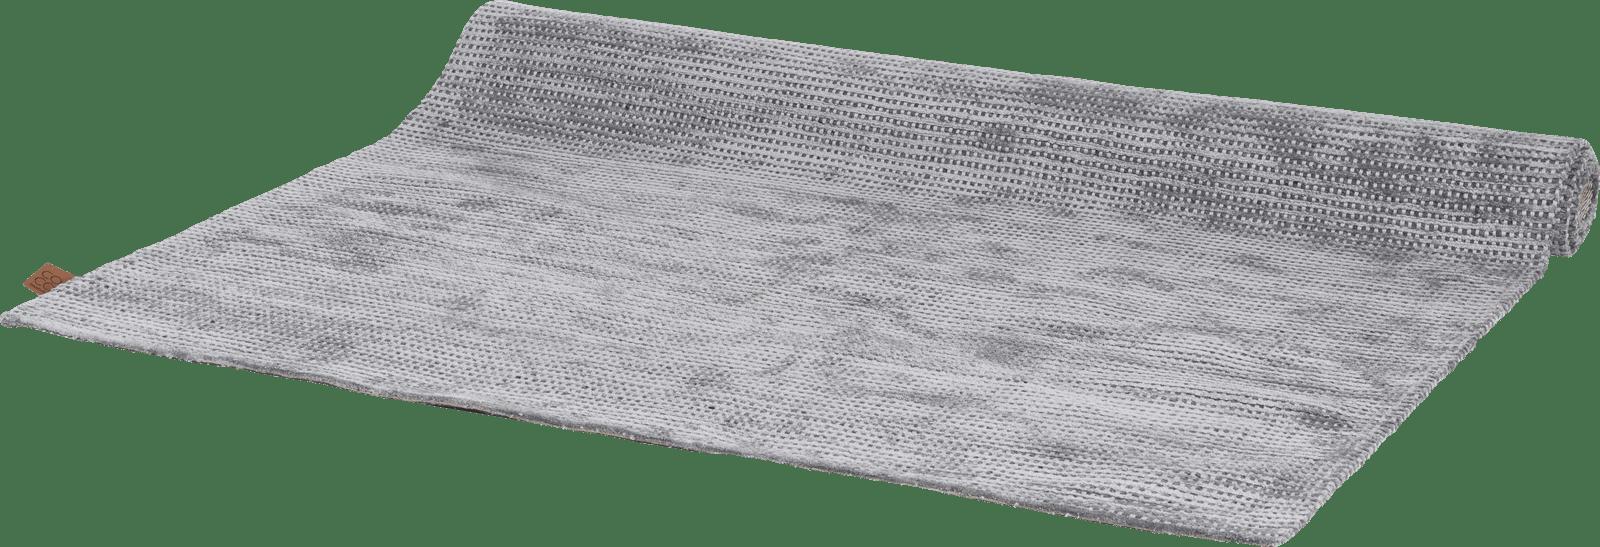 XOOON - Coco Maison - harper rug 160x230cm